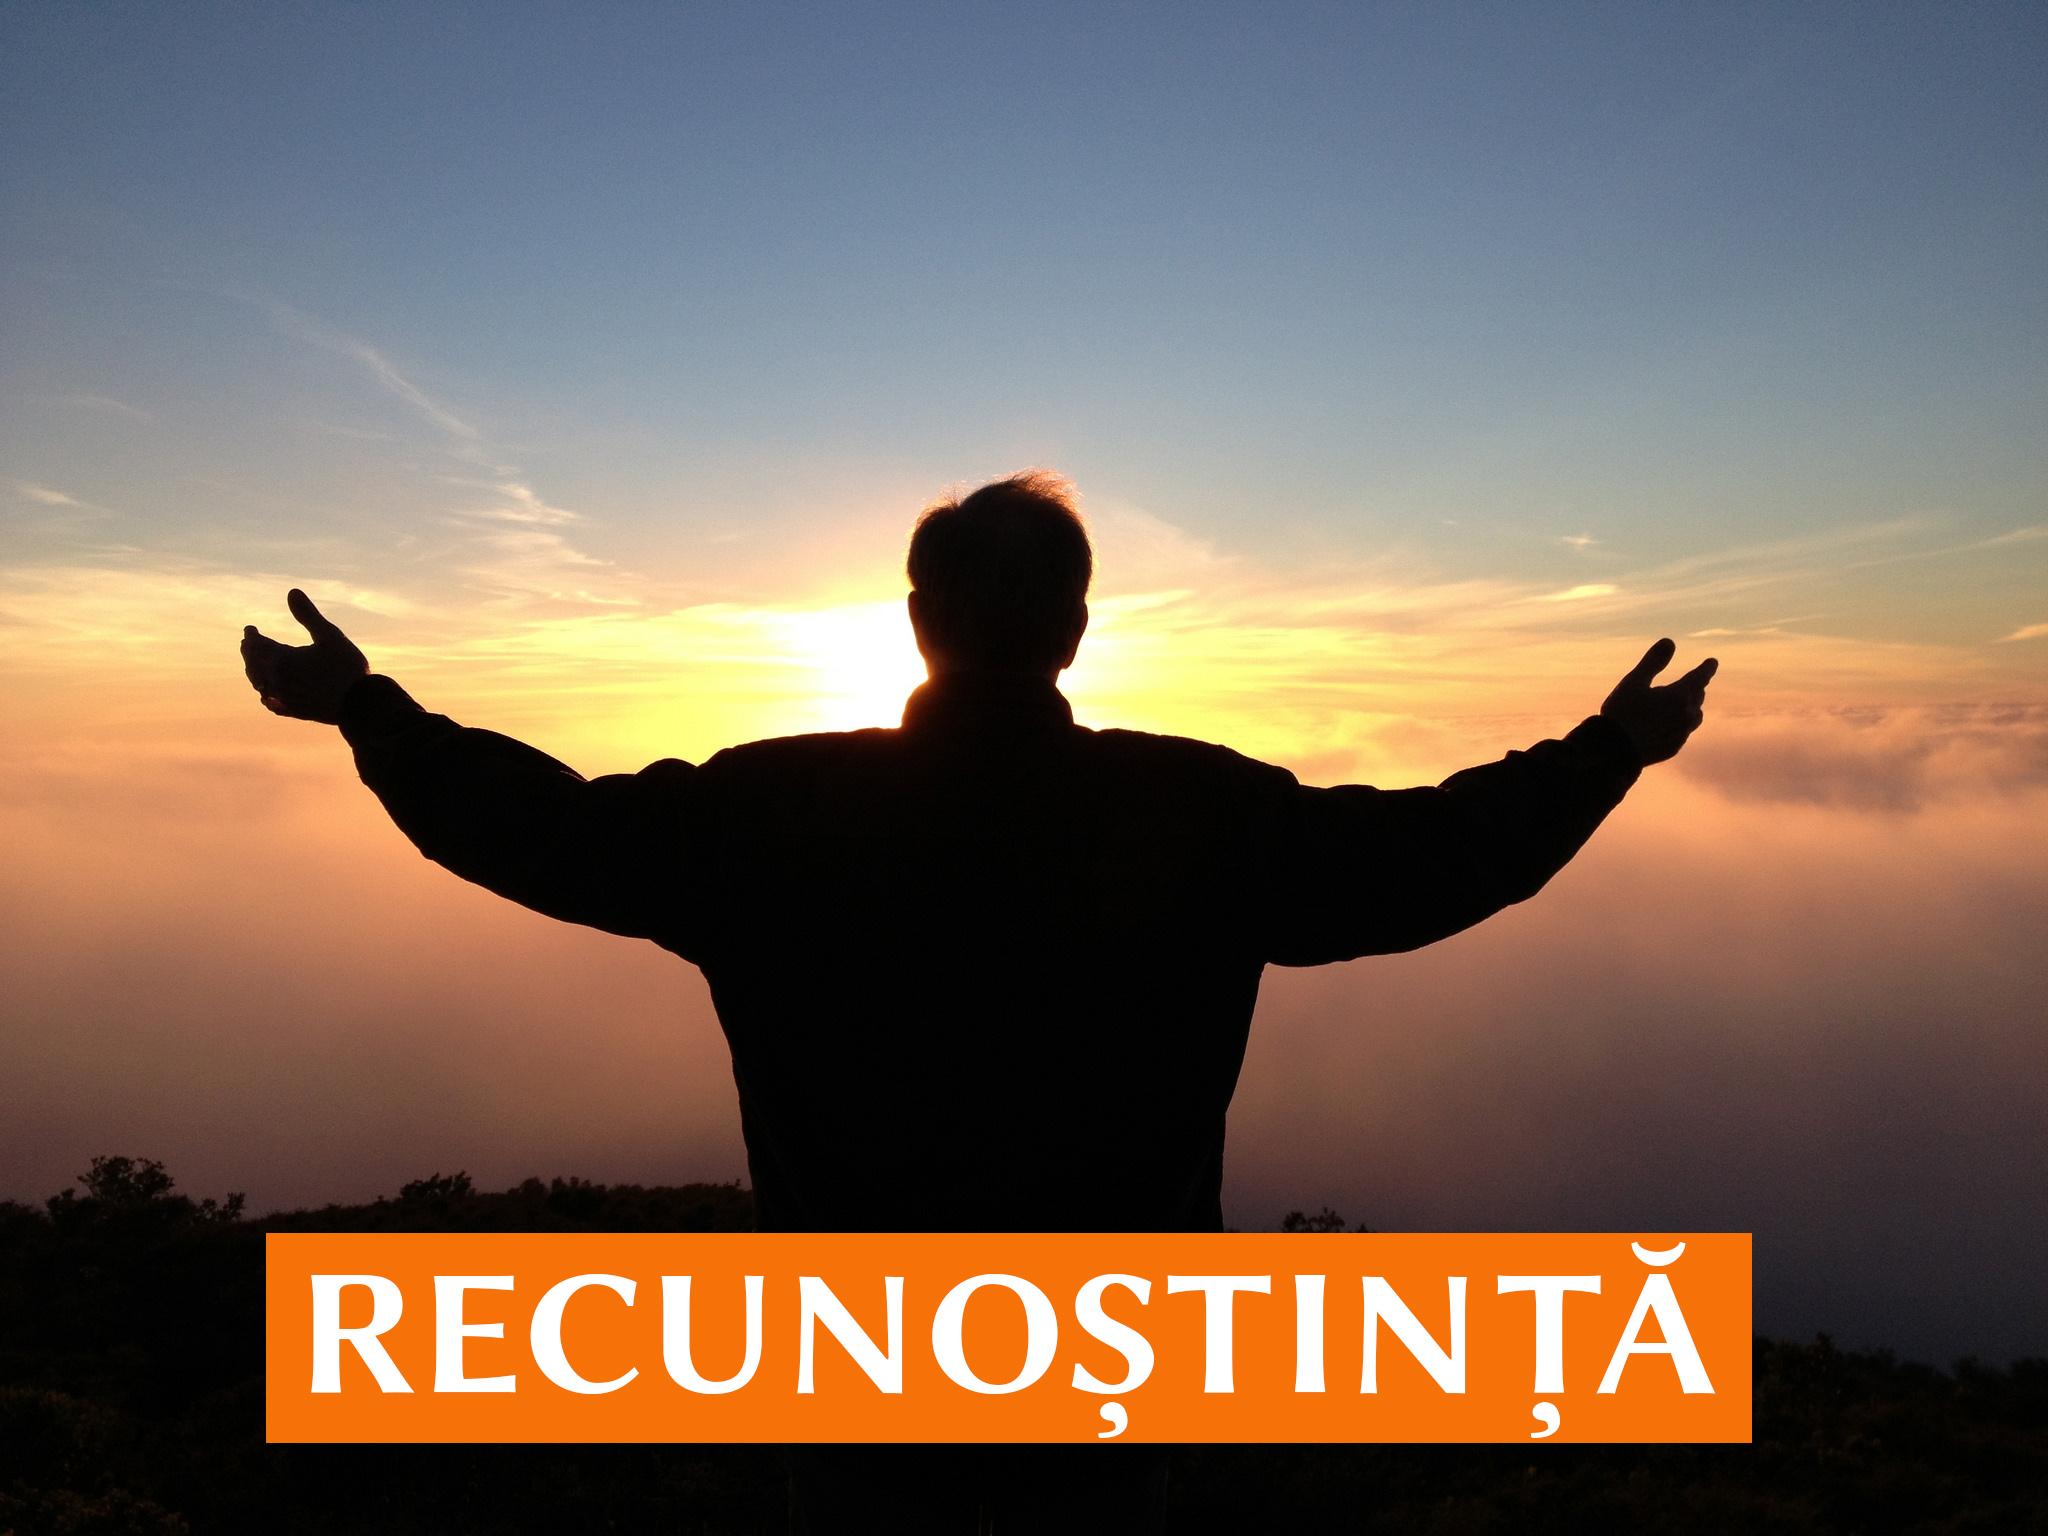 recunostinta_www.fiimplinit.ro_